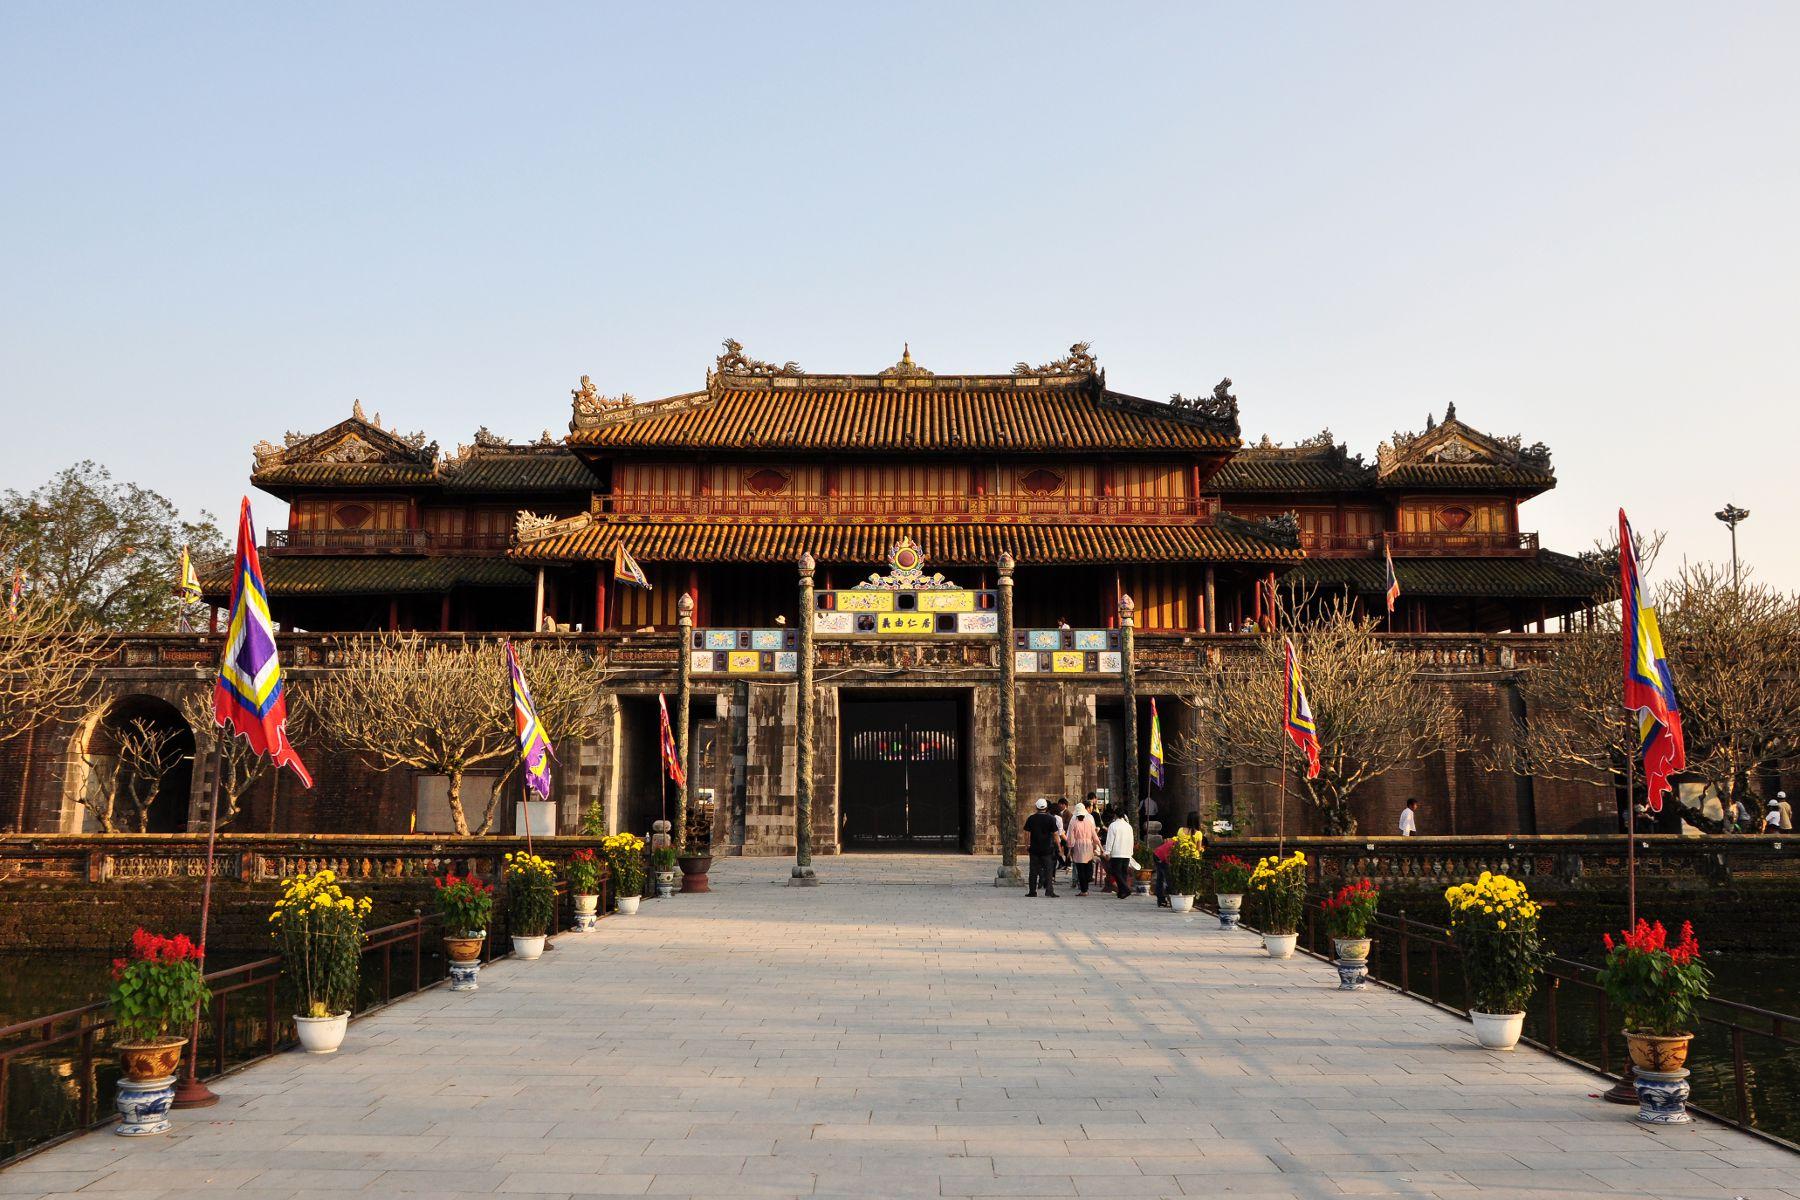 Hu vietnam arts et voyages for Appart hotel etranger